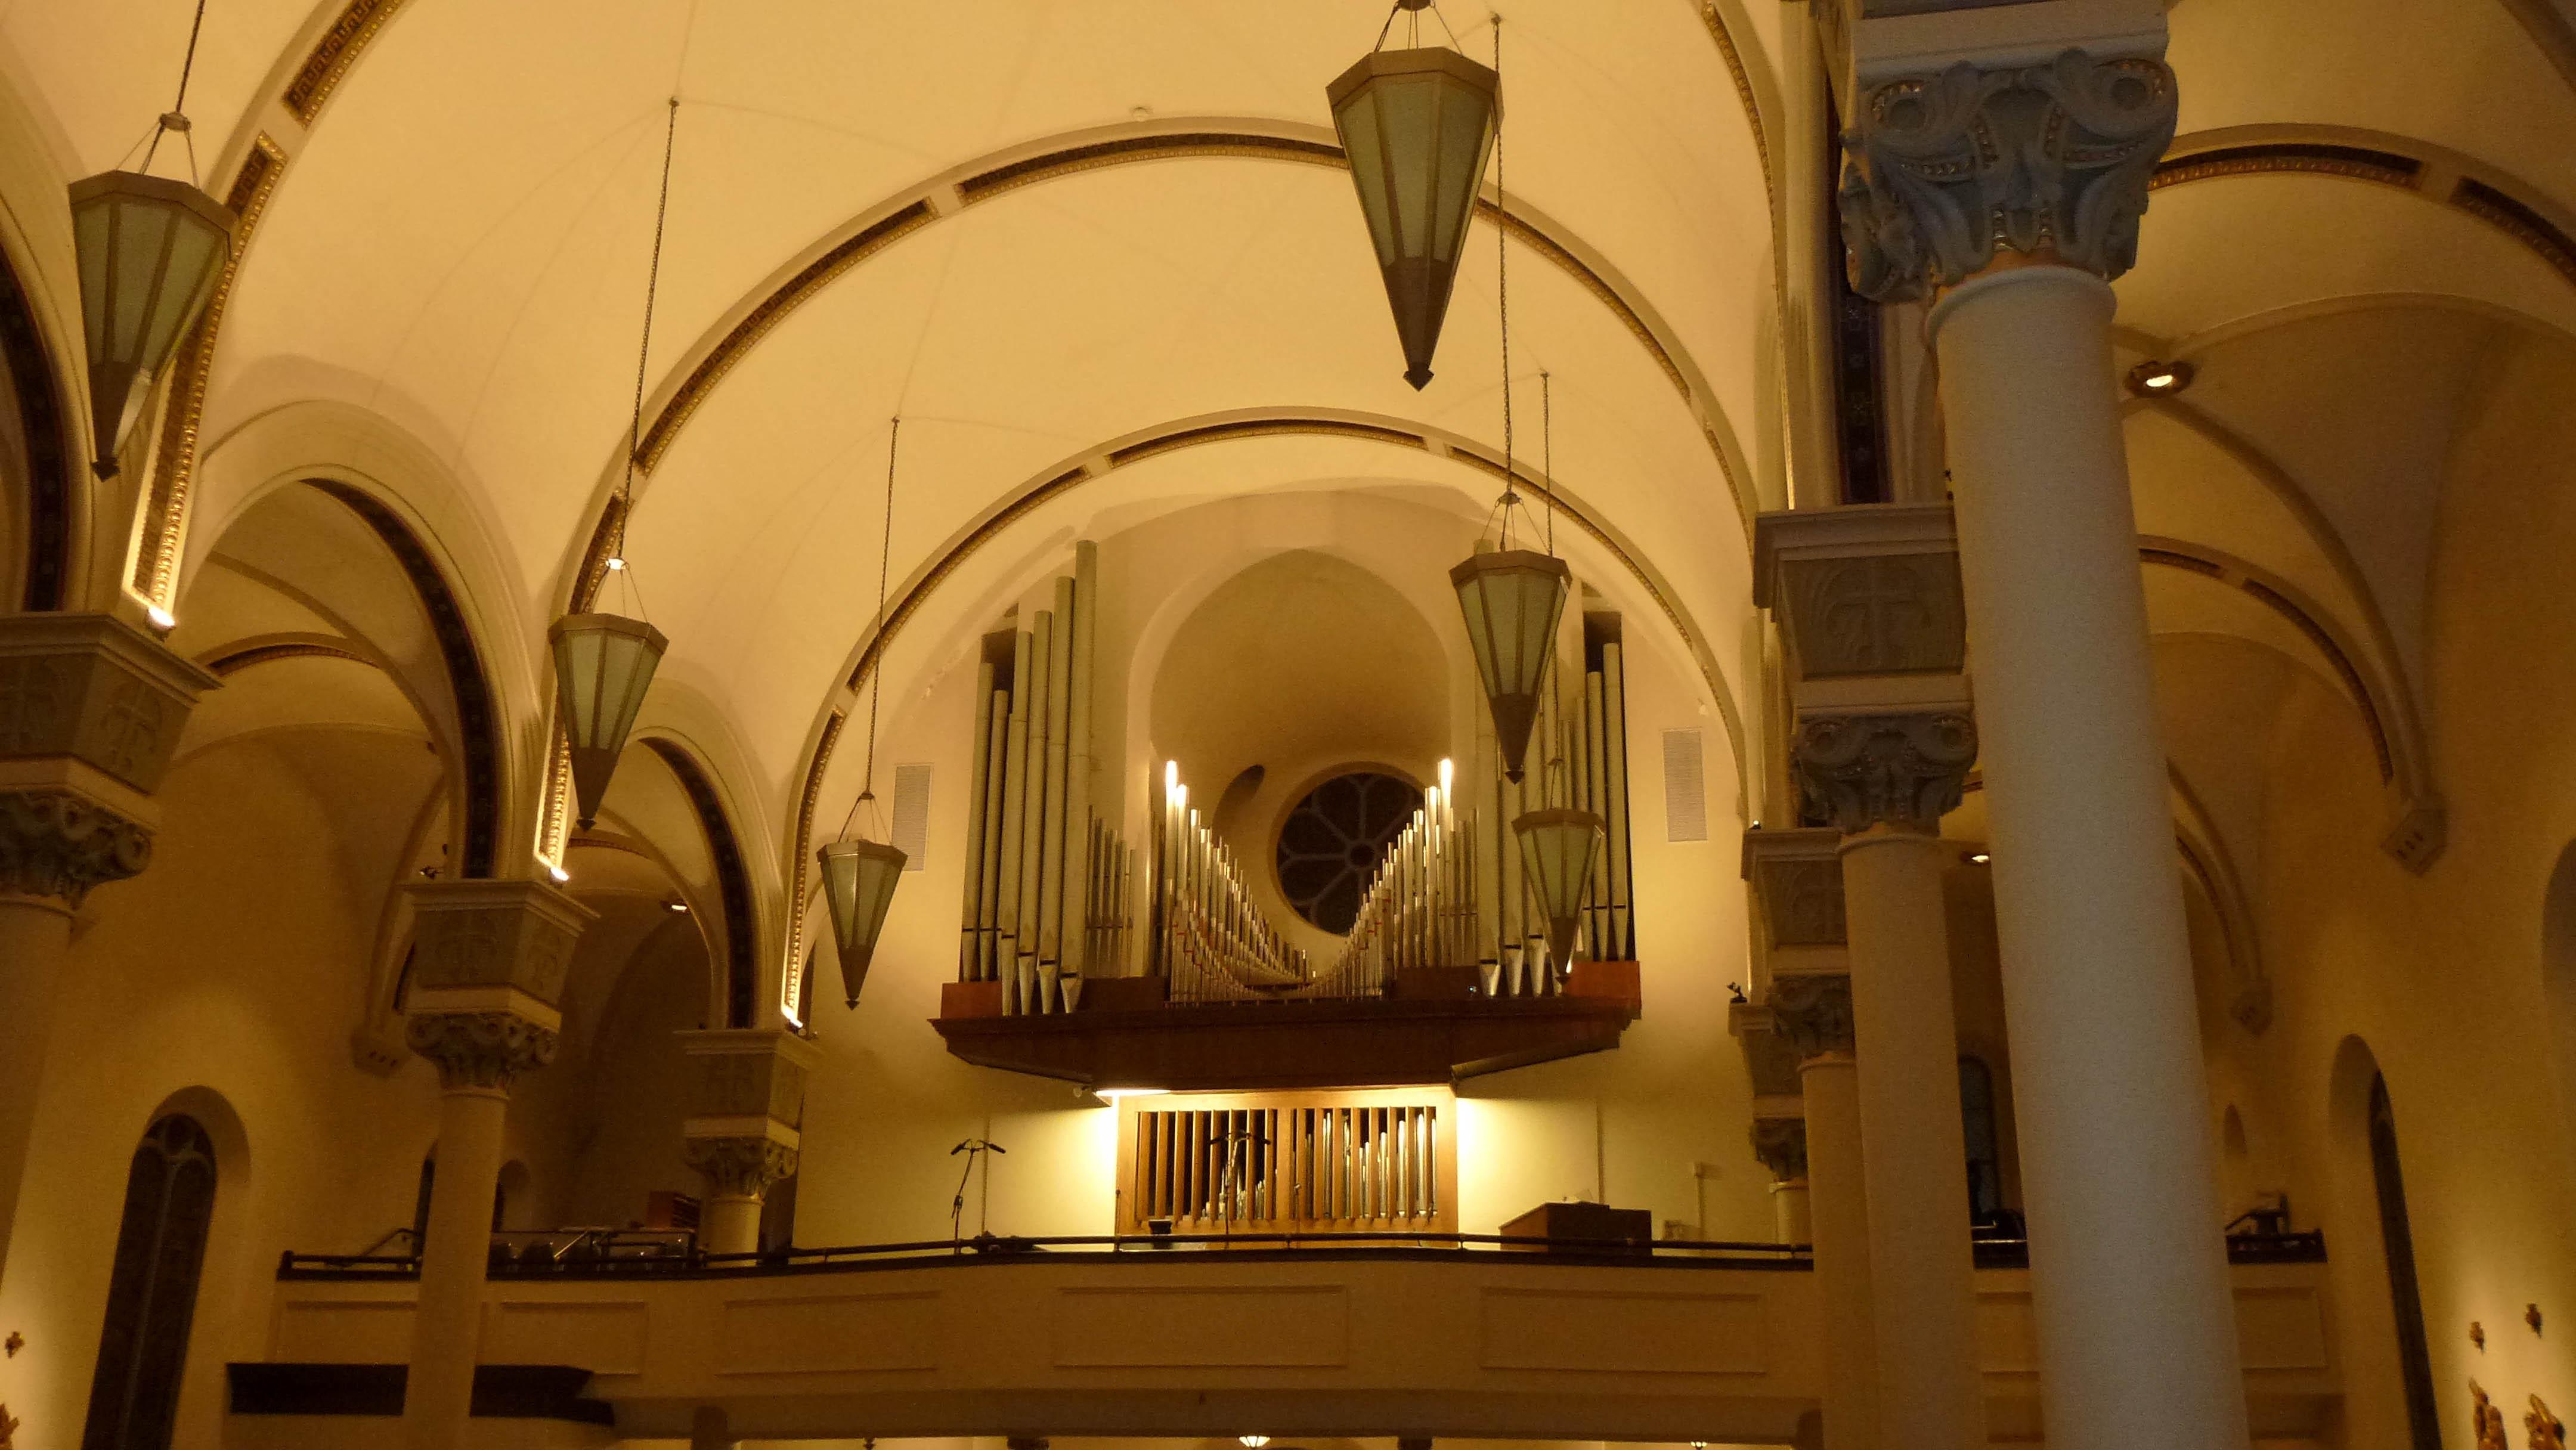 Organ gallery view